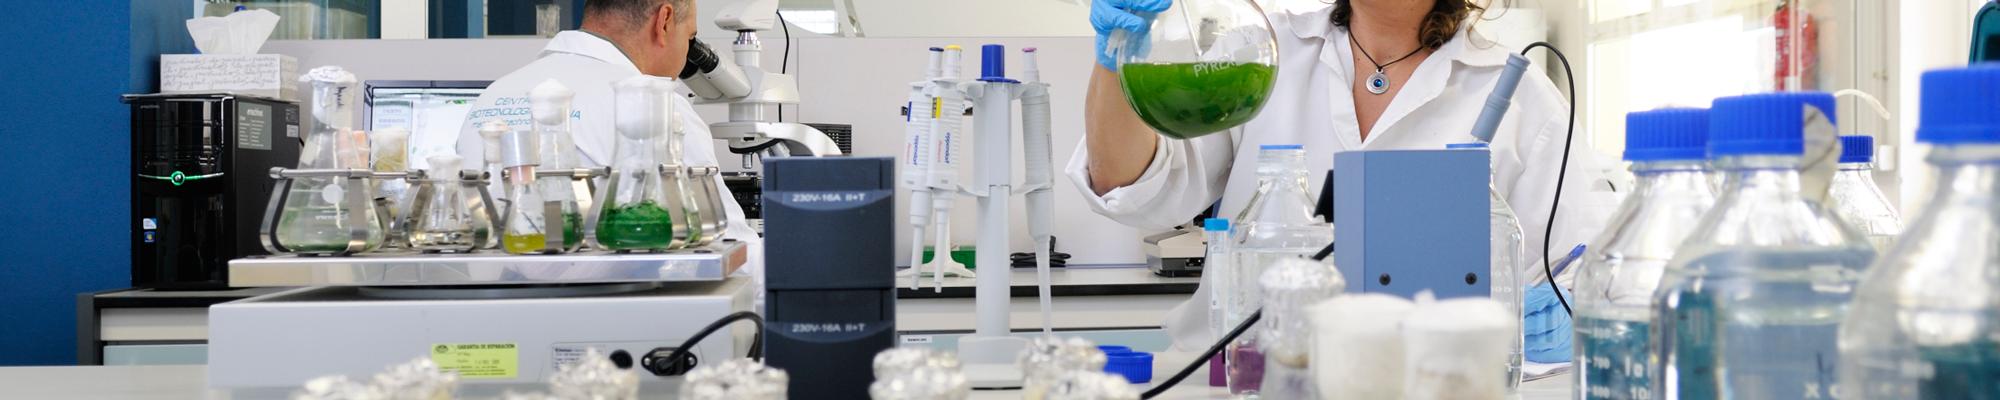 Laboratorio del Banco Español de Algas (BEA) - MicroBioSpain